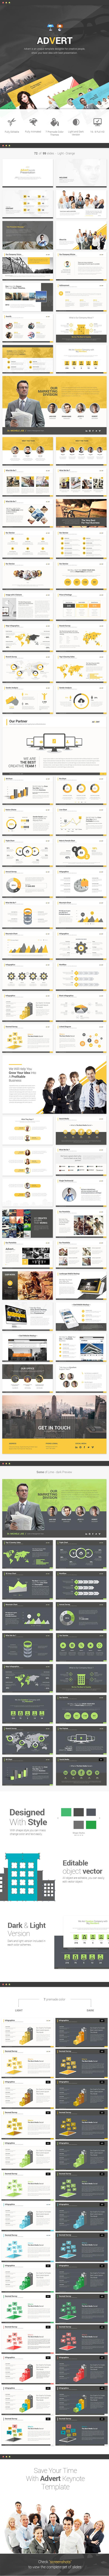 Advert - Keynote Presentation - Creative Keynote Templates